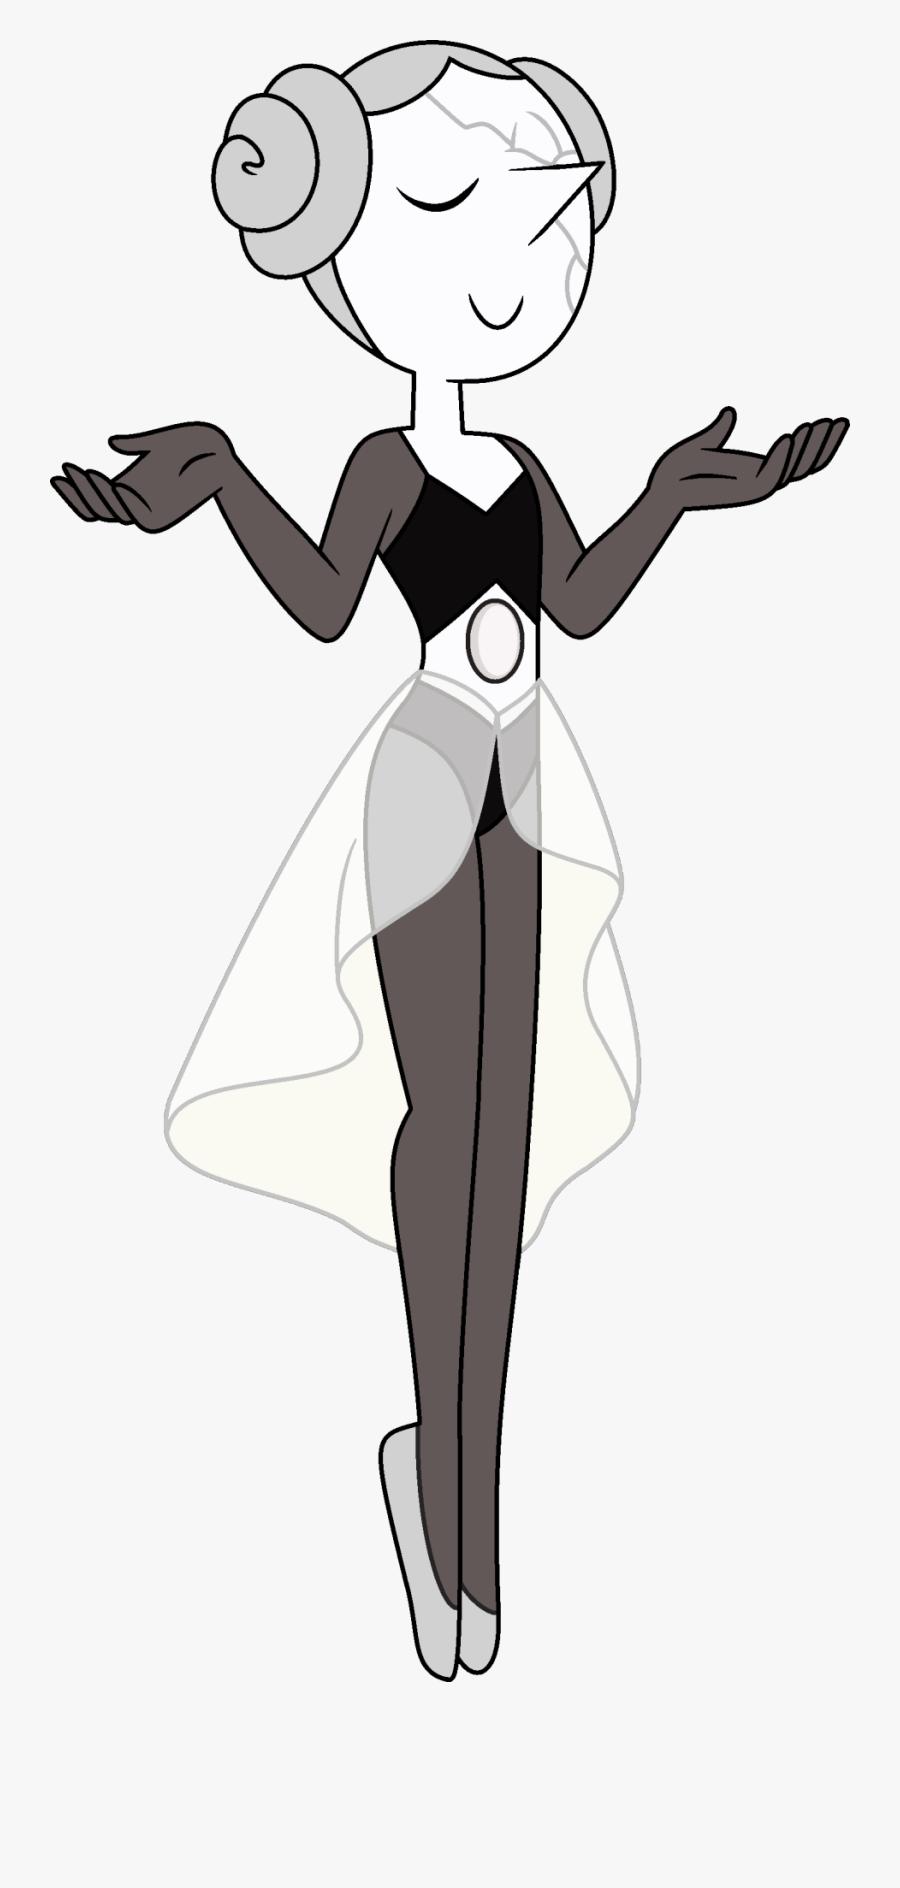 Transparent Penguin Sliding On Belly Clipart - White Diamonds Pearl Steven Universe, Transparent Clipart